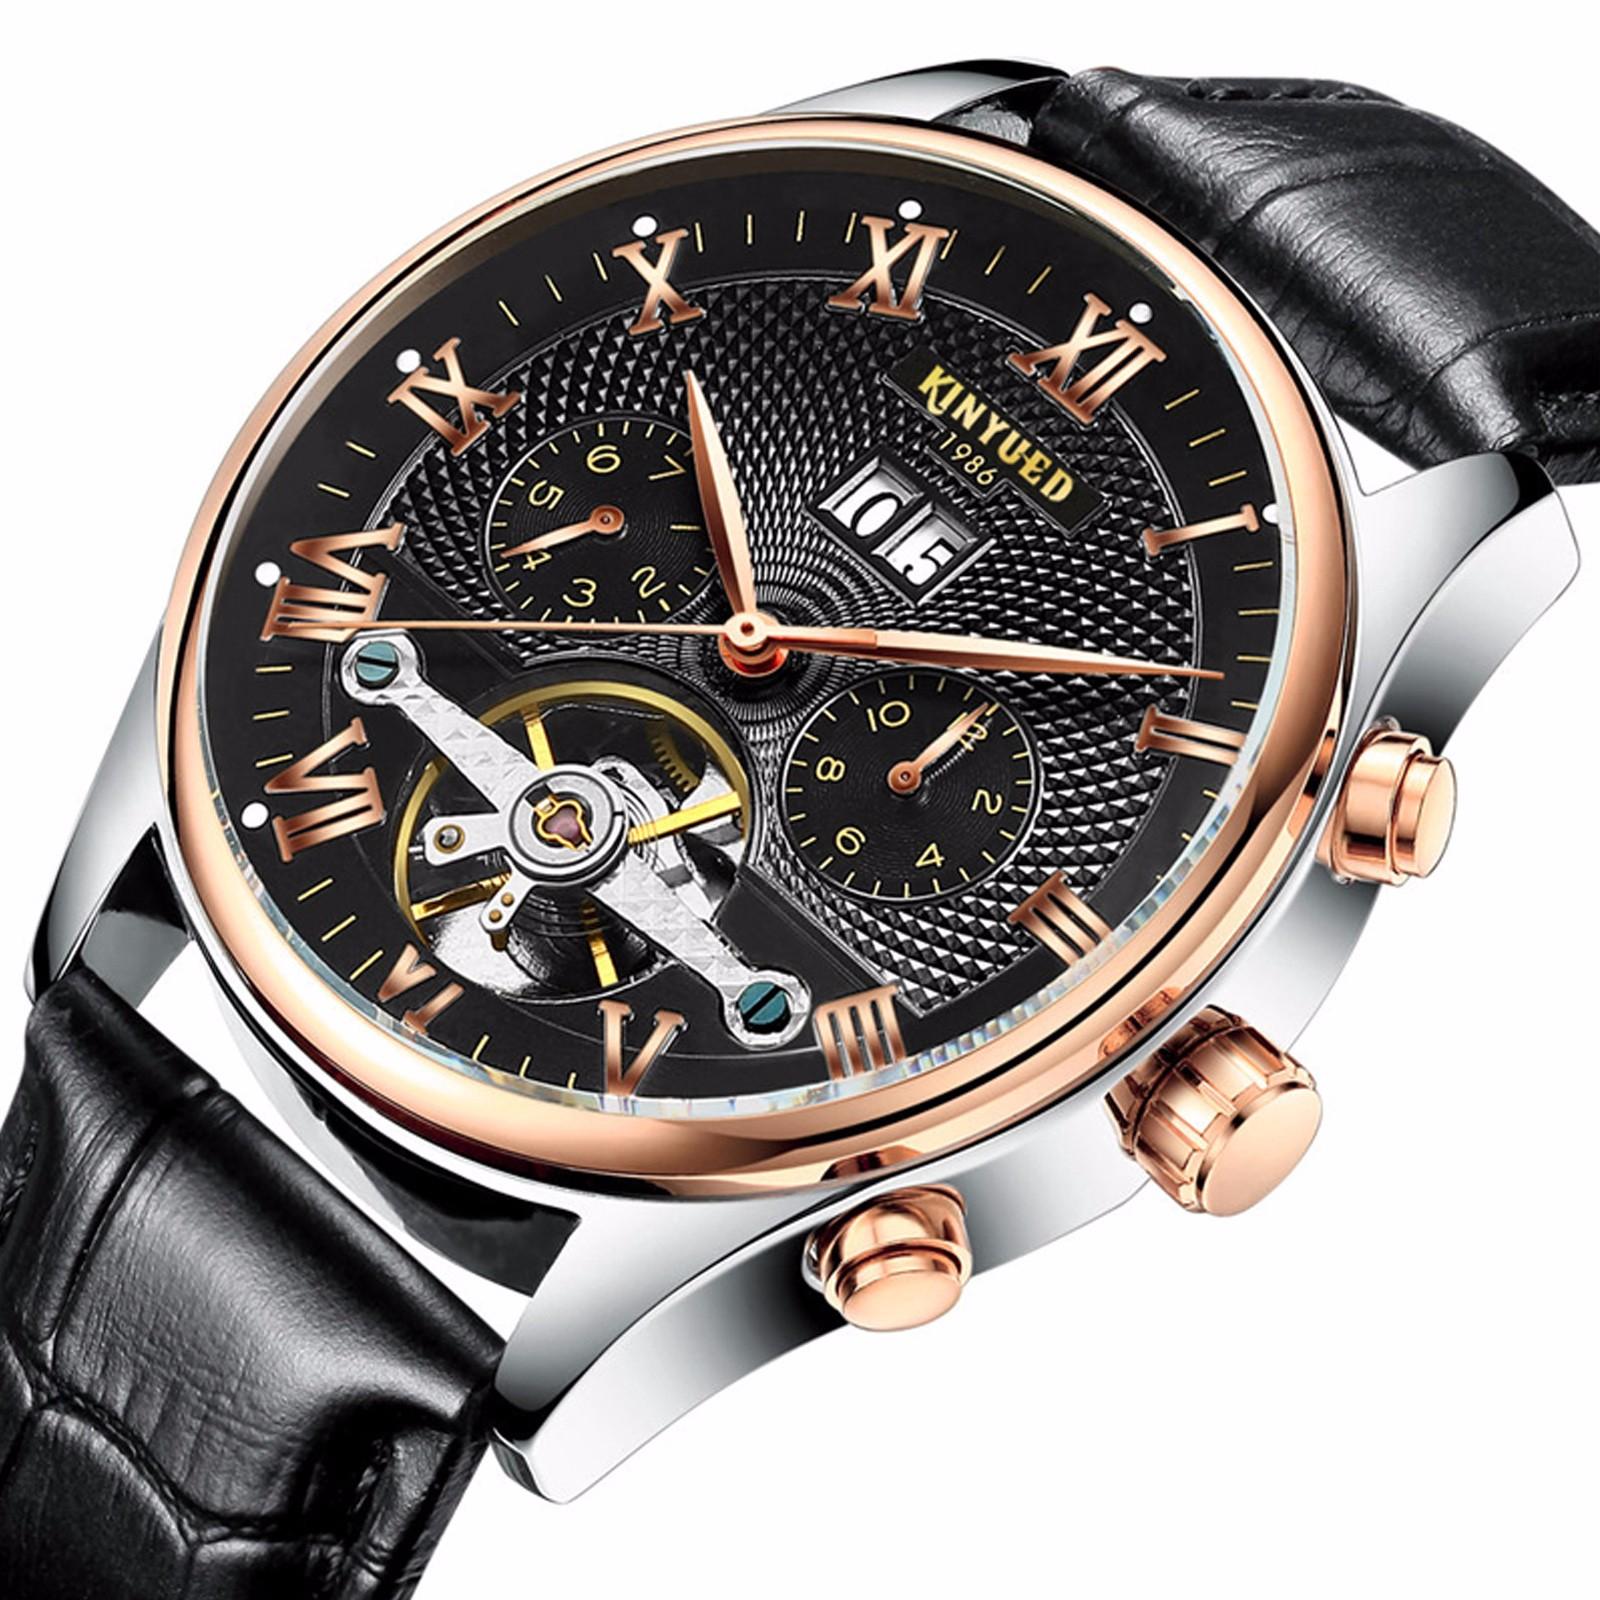 Wrist watches brands for mens - Kinyued Luxury Mens Genuine Leather Date Tourbillon Auto Mechanical Wrist Watch Item Description